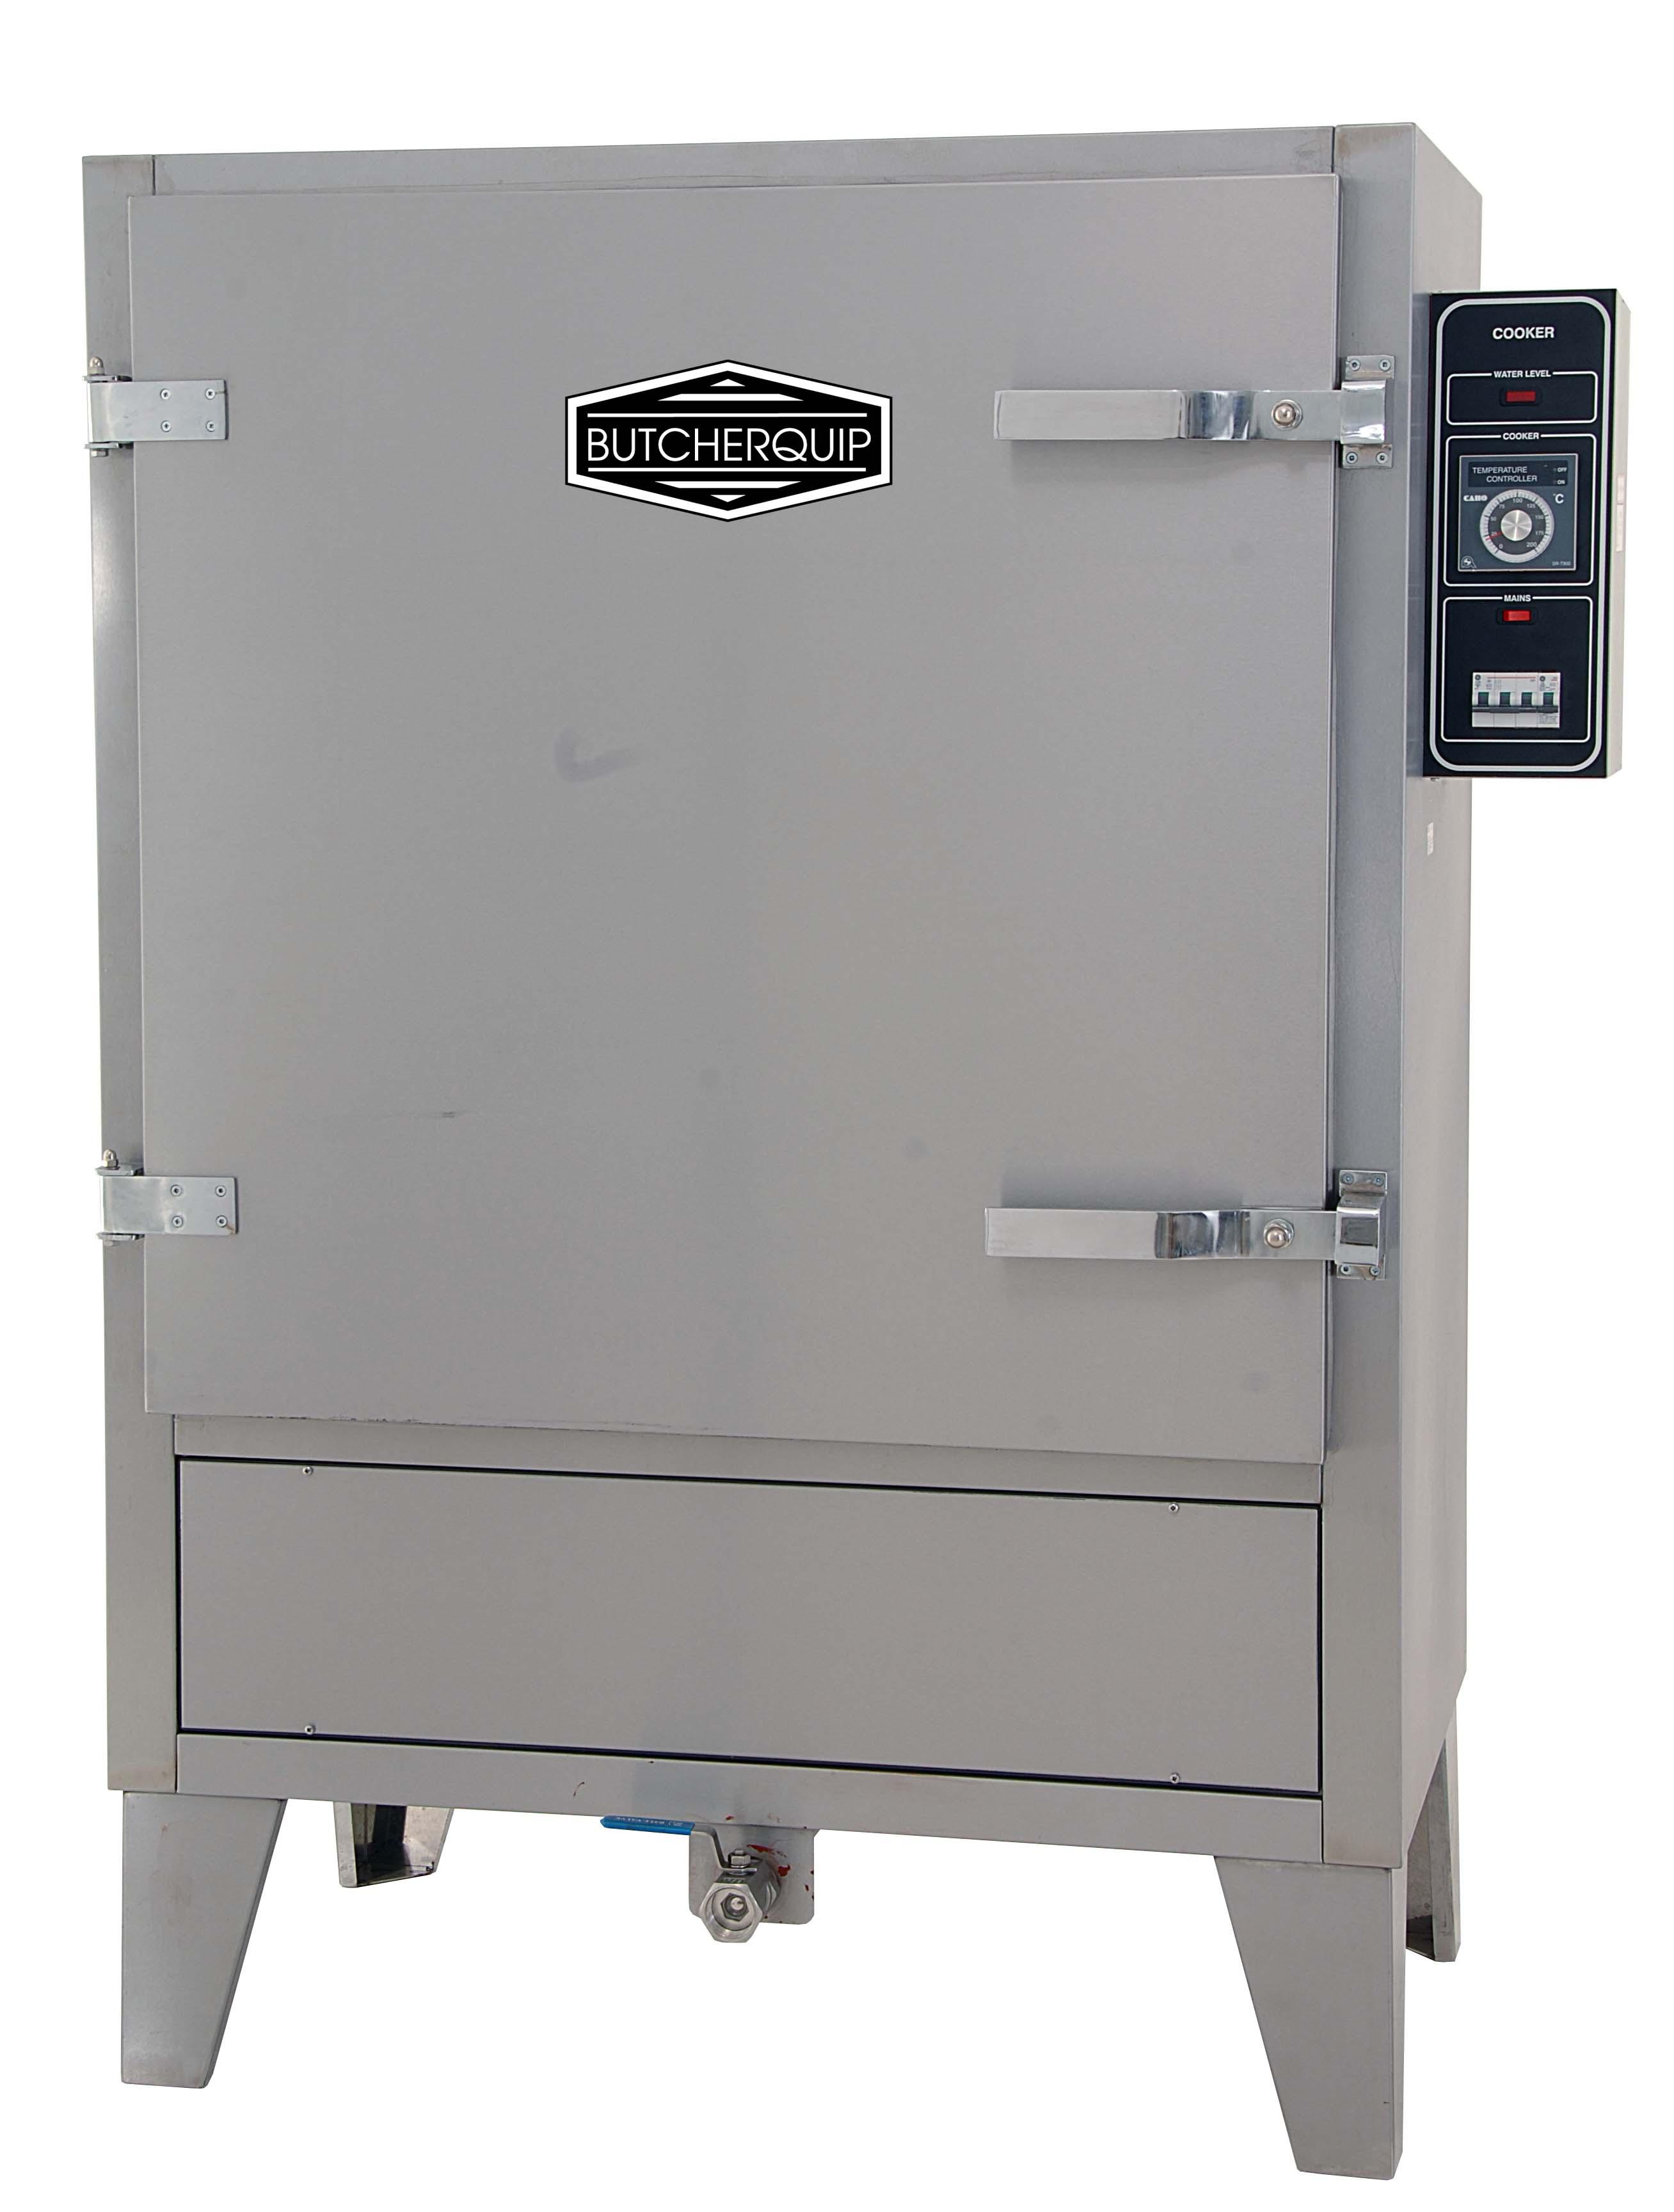 ccb0600--cooker-cabinet-butcherquip--economy--600lt